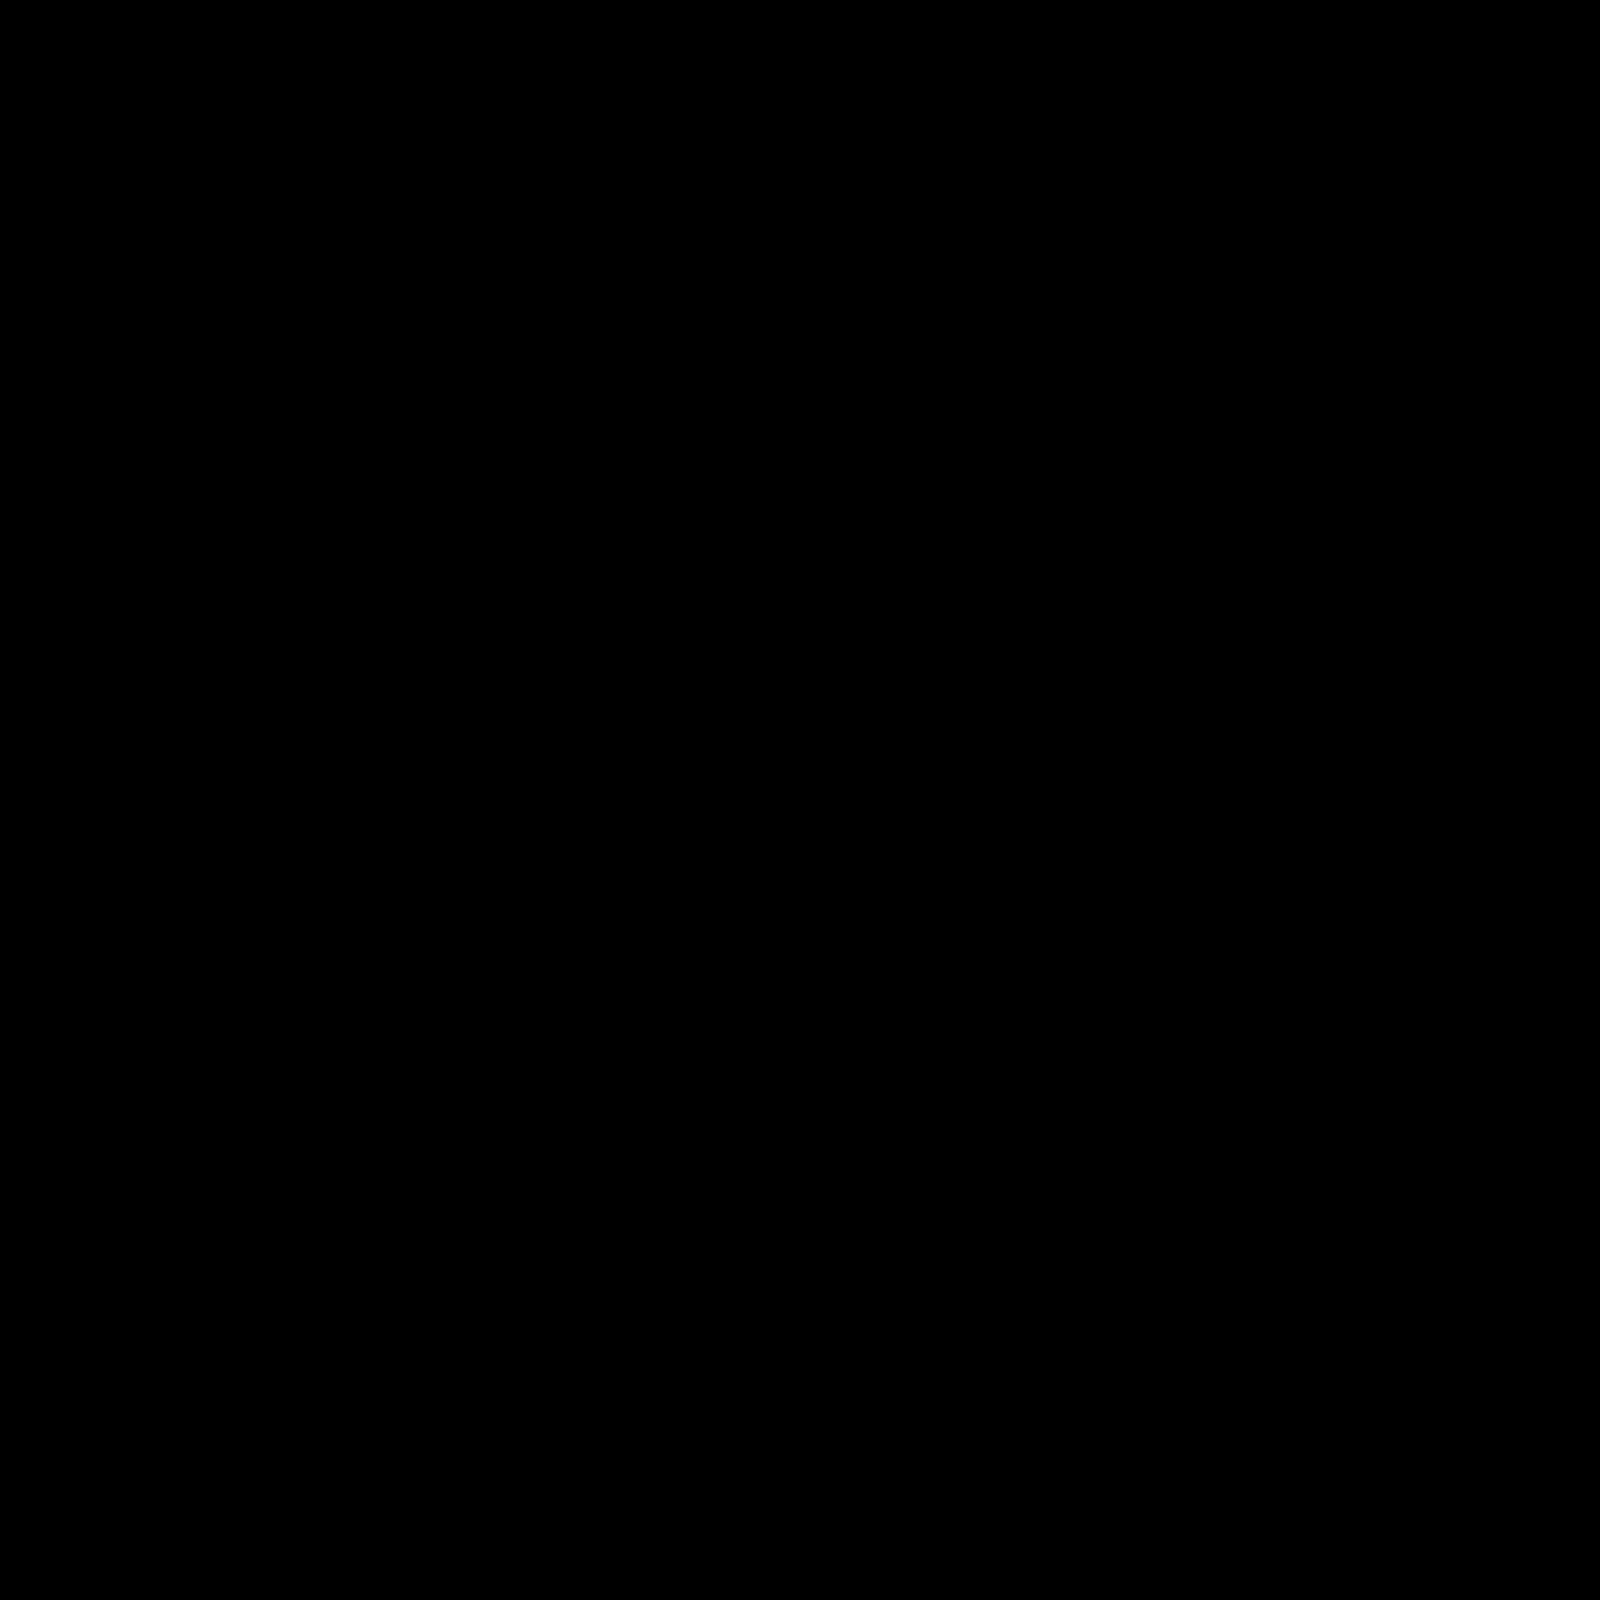 Job Seeker icon